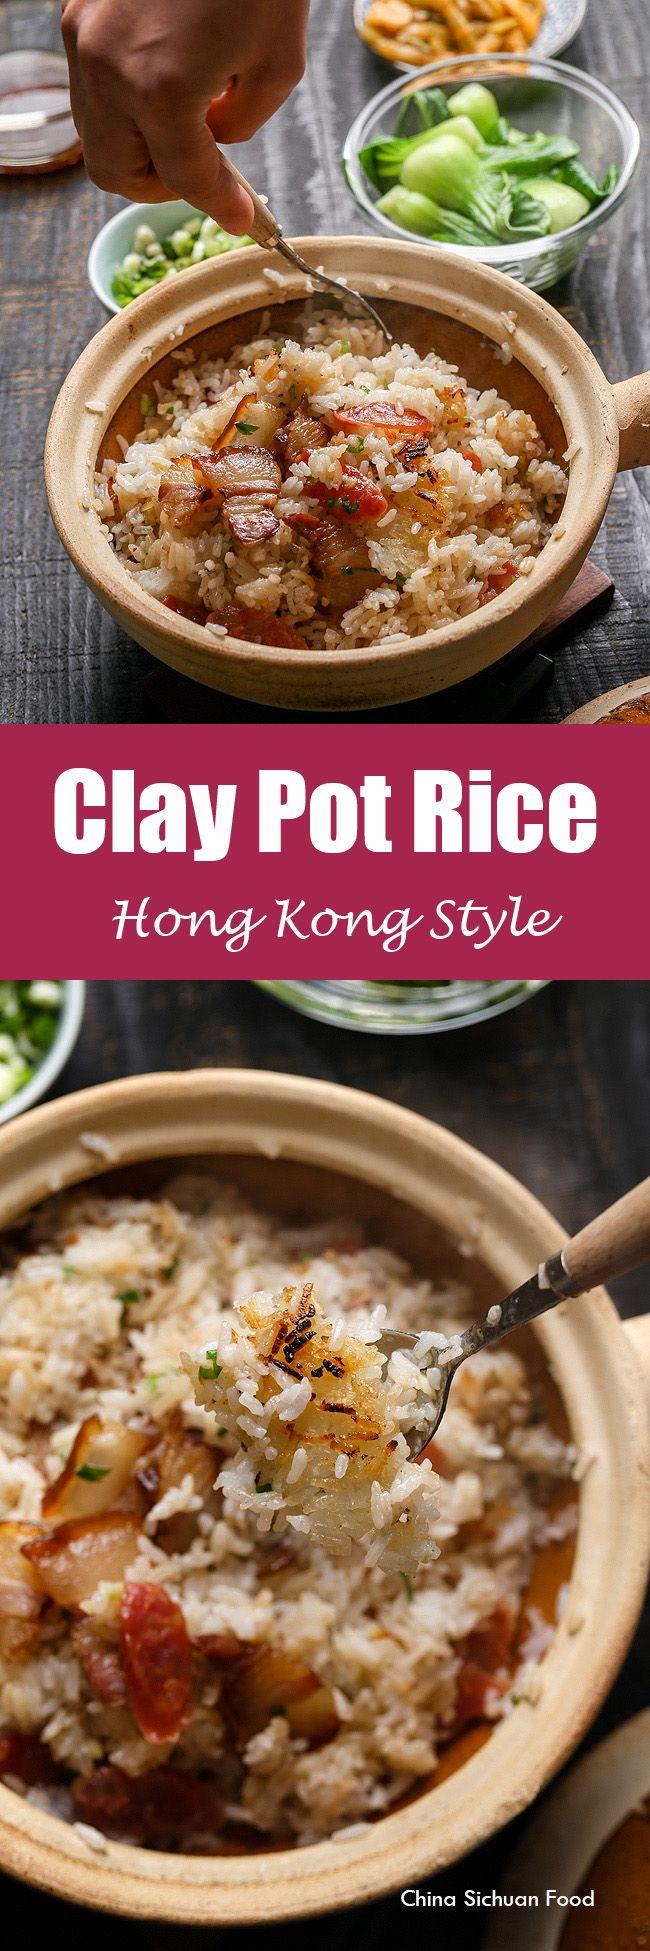 Clay Pot Rice | ChinaSichuanFood.com